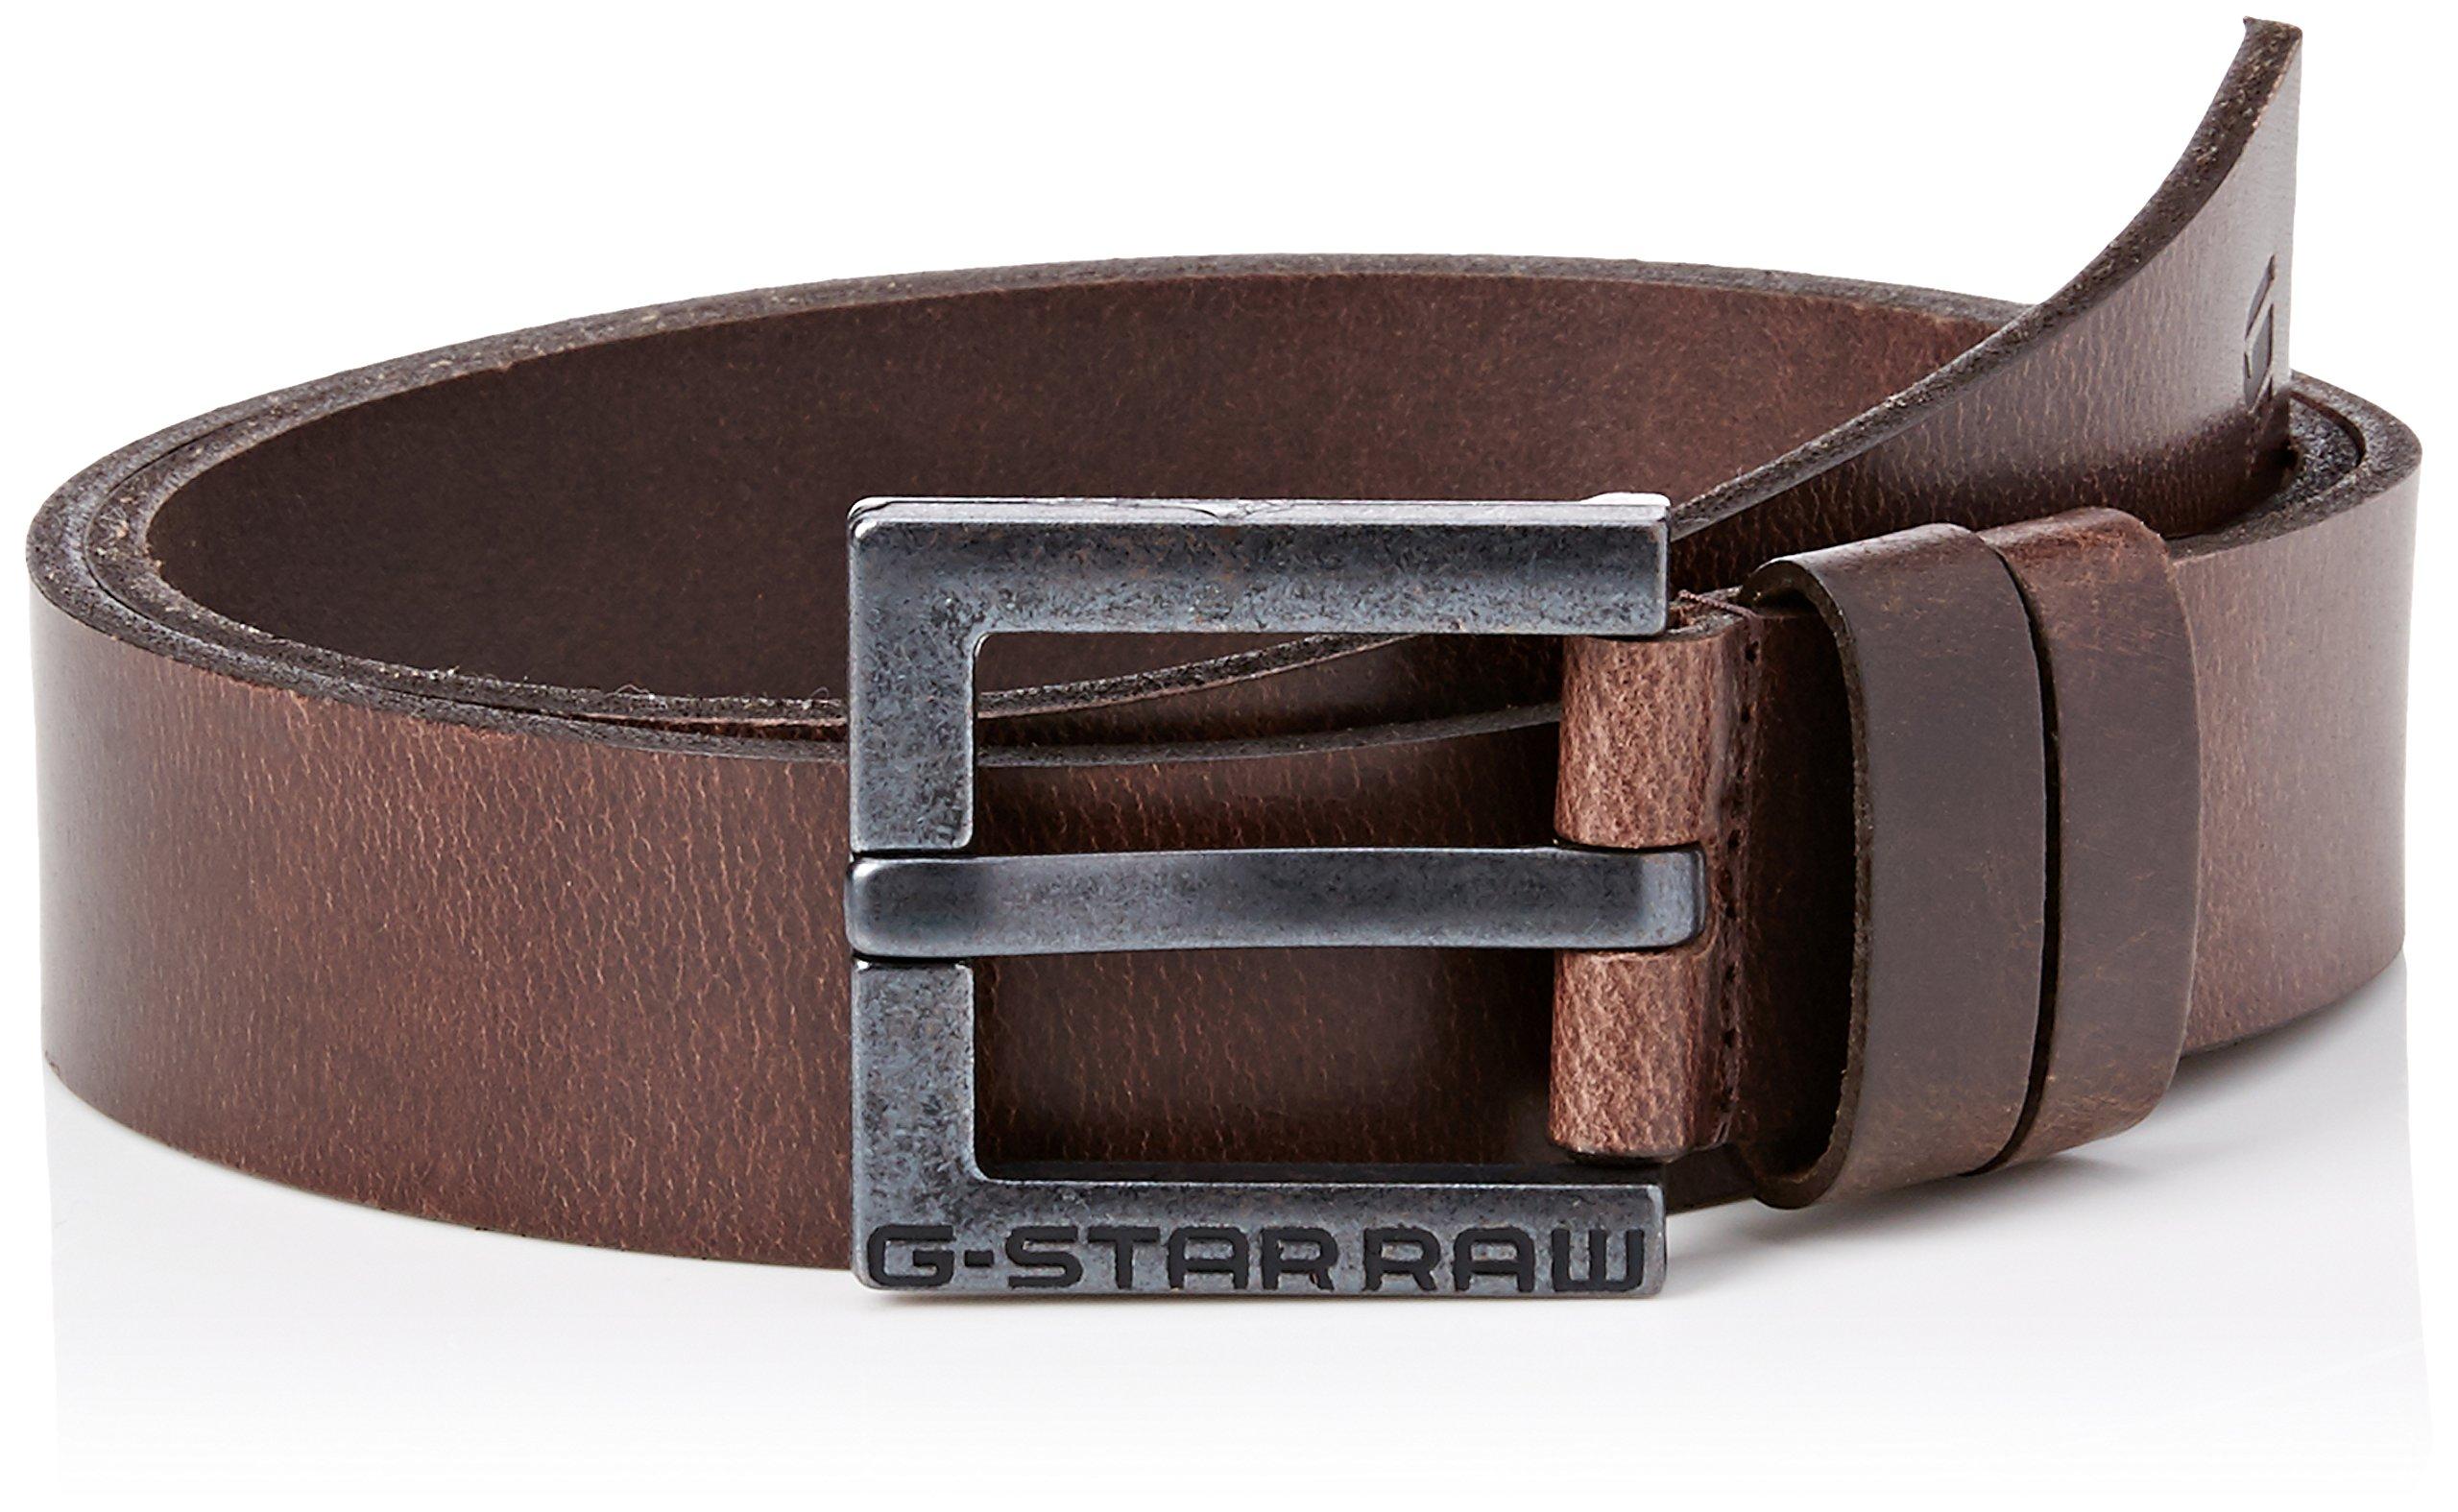 G-STAR RAW Duko Belt Cinturón para Hombre